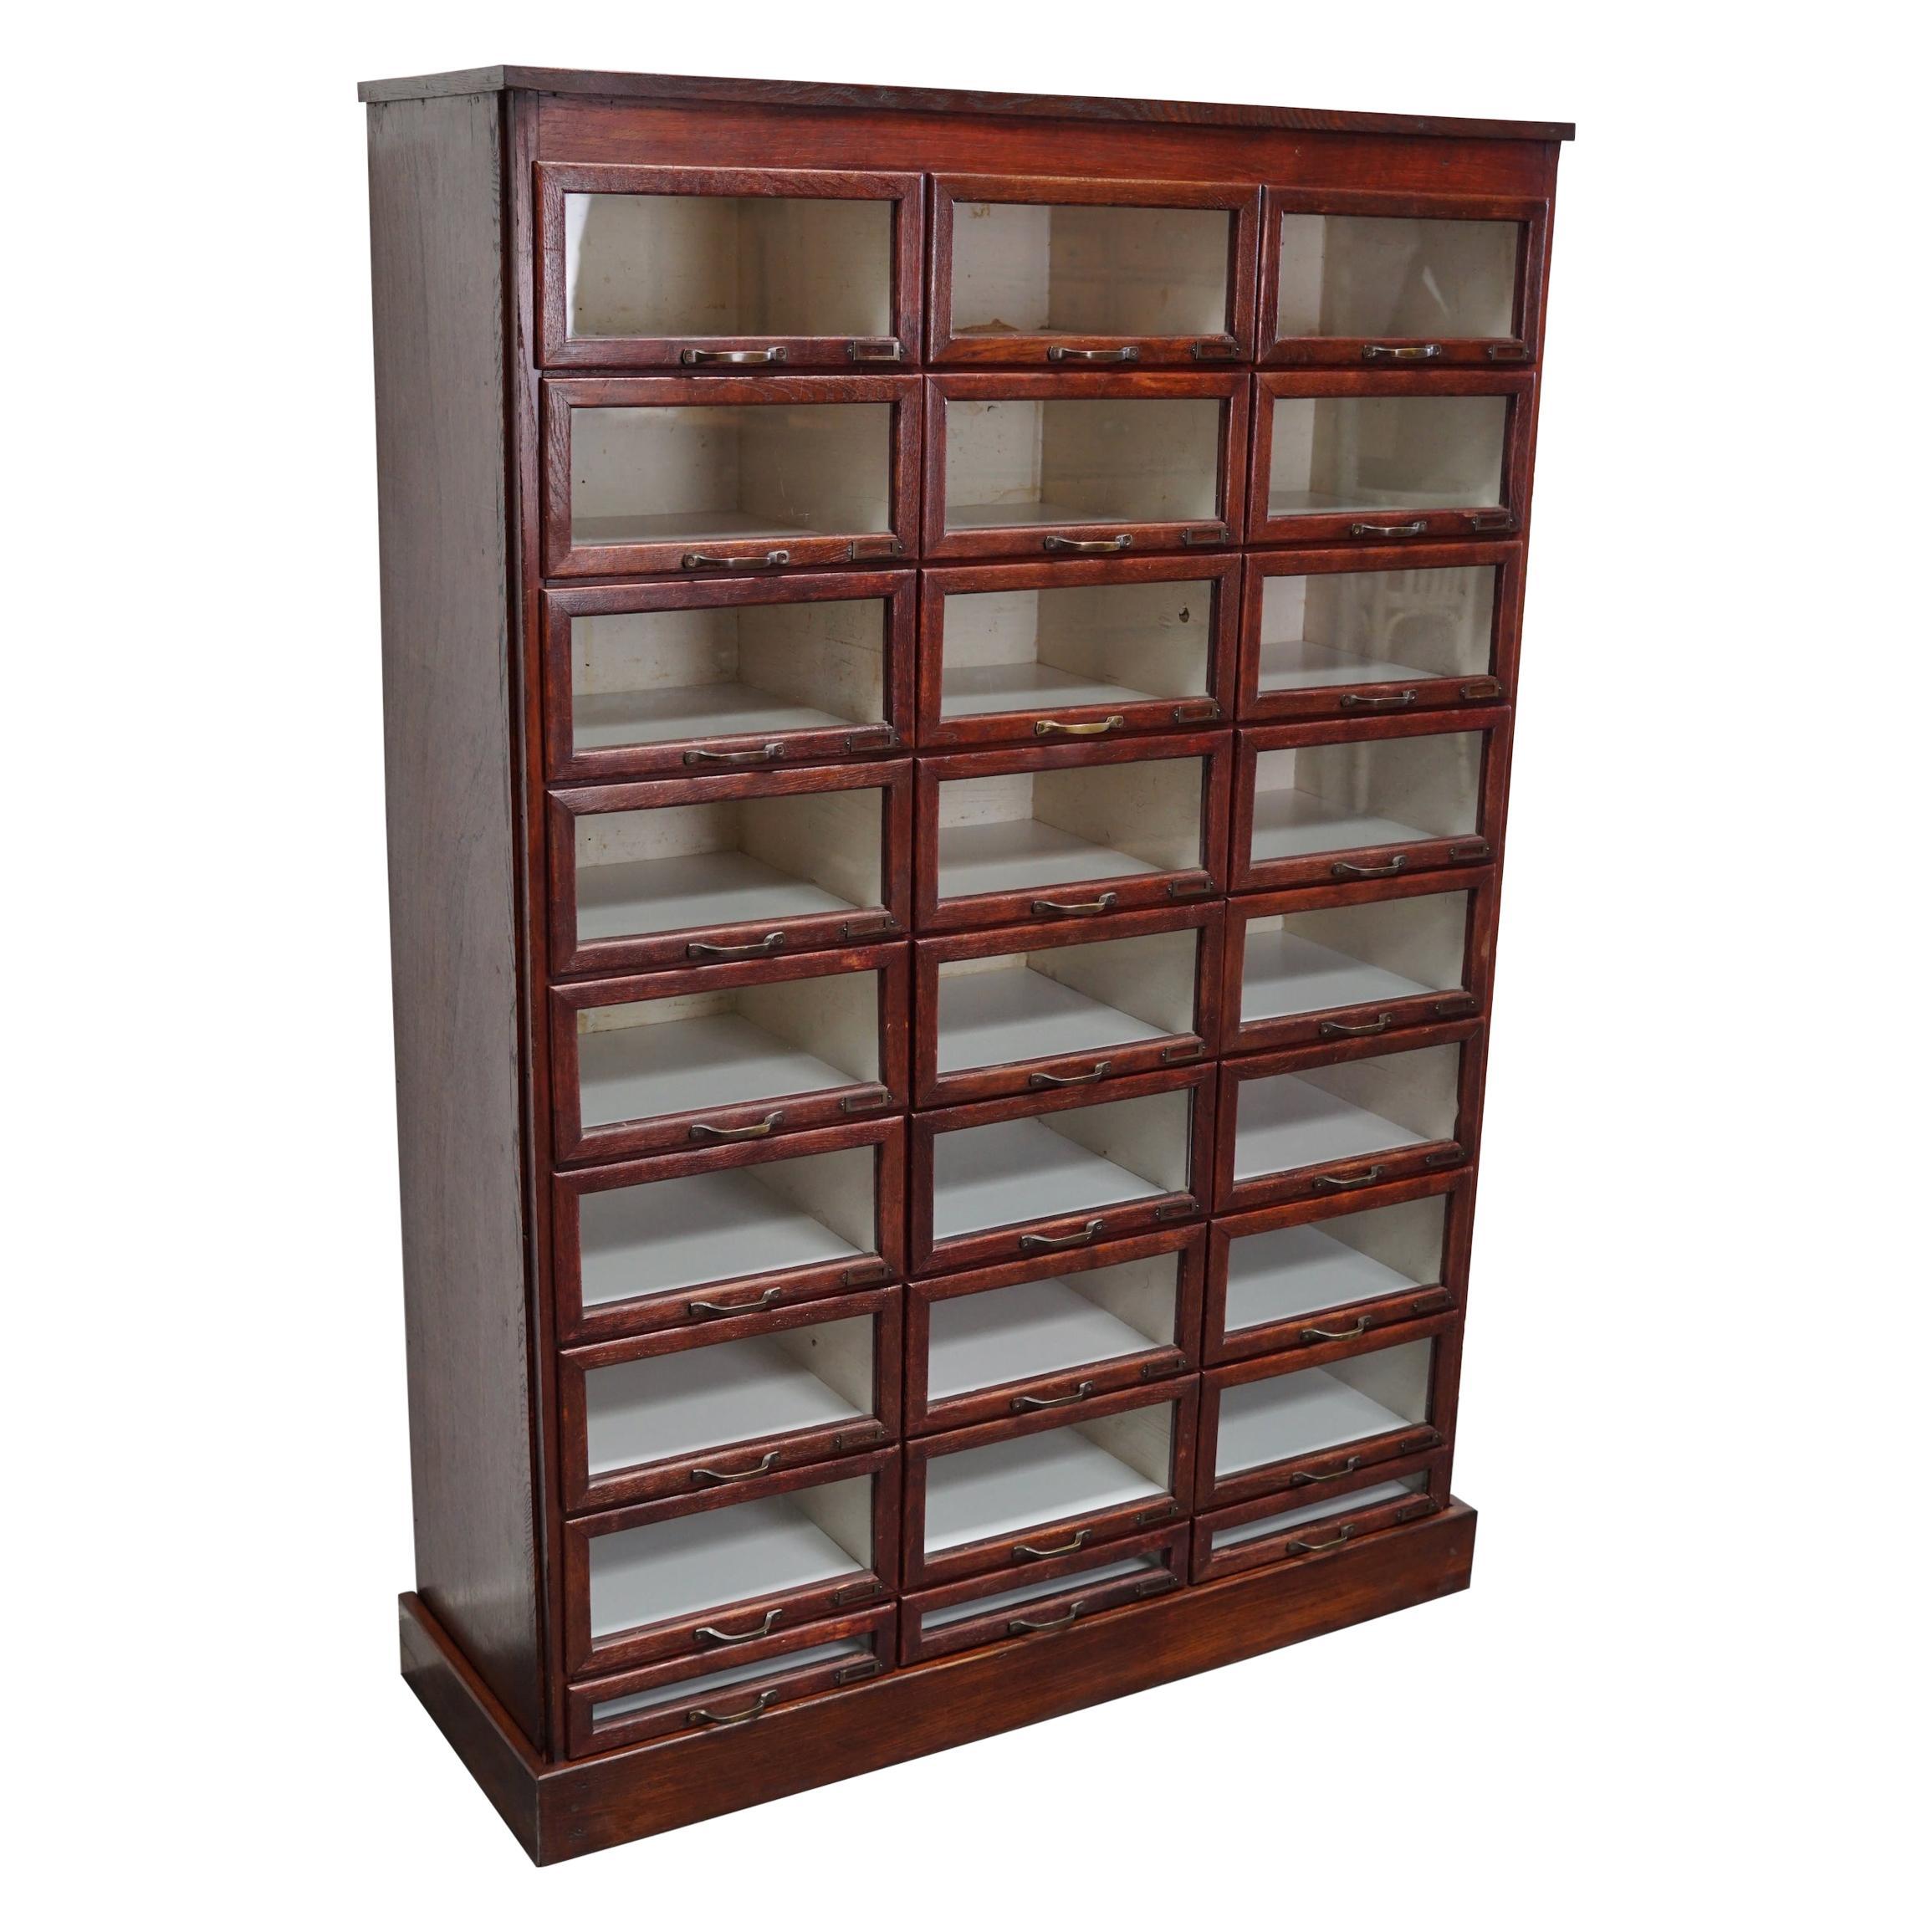 Vintage Dutch Oak Haberdashery Shop Cabinet, 1930s